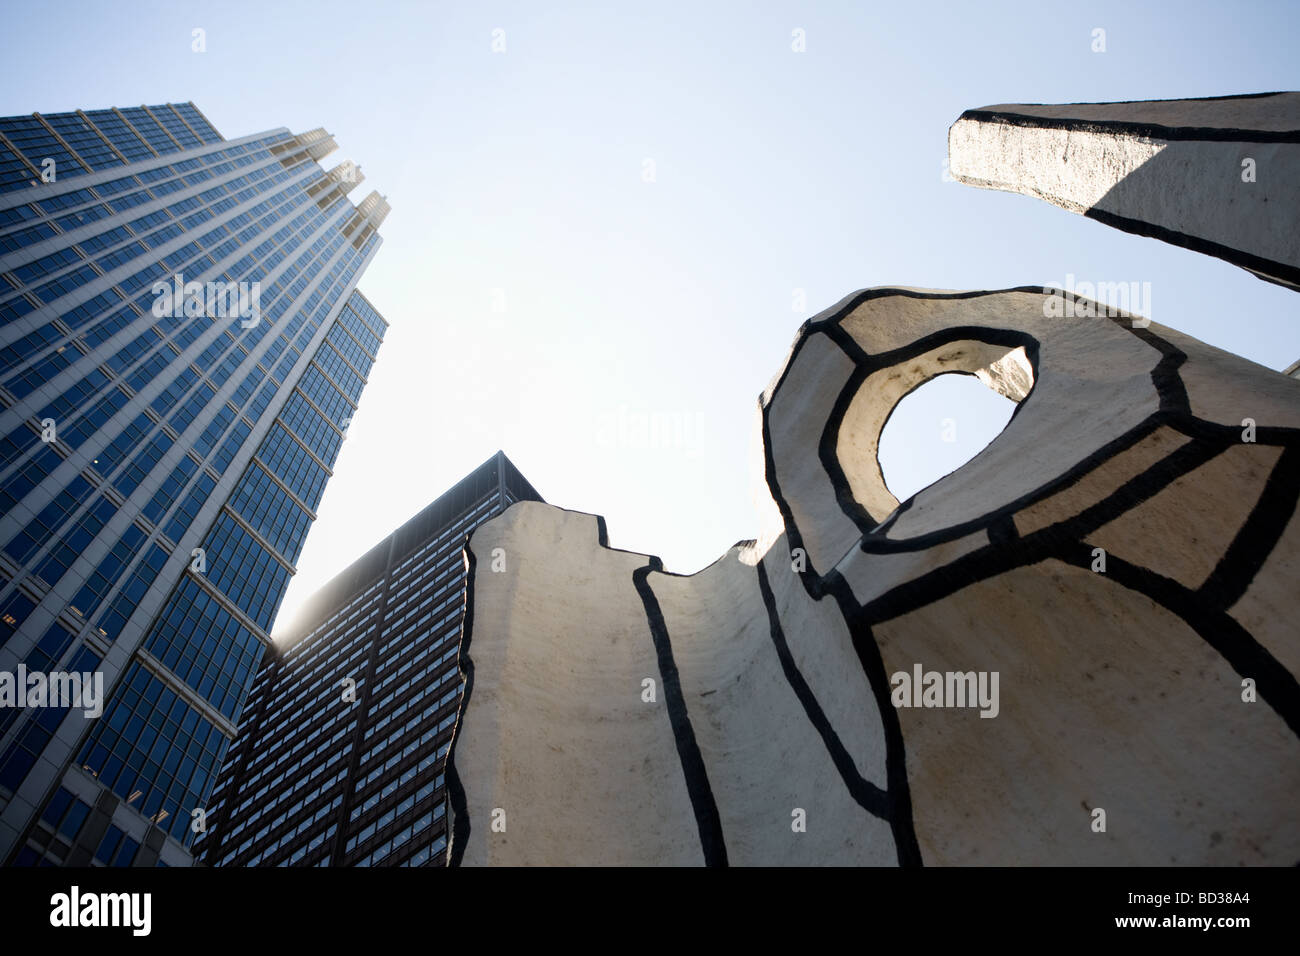 Dubuffet Skulptur in Daley Plaza der Schleife Chicago Illinois Stockbild